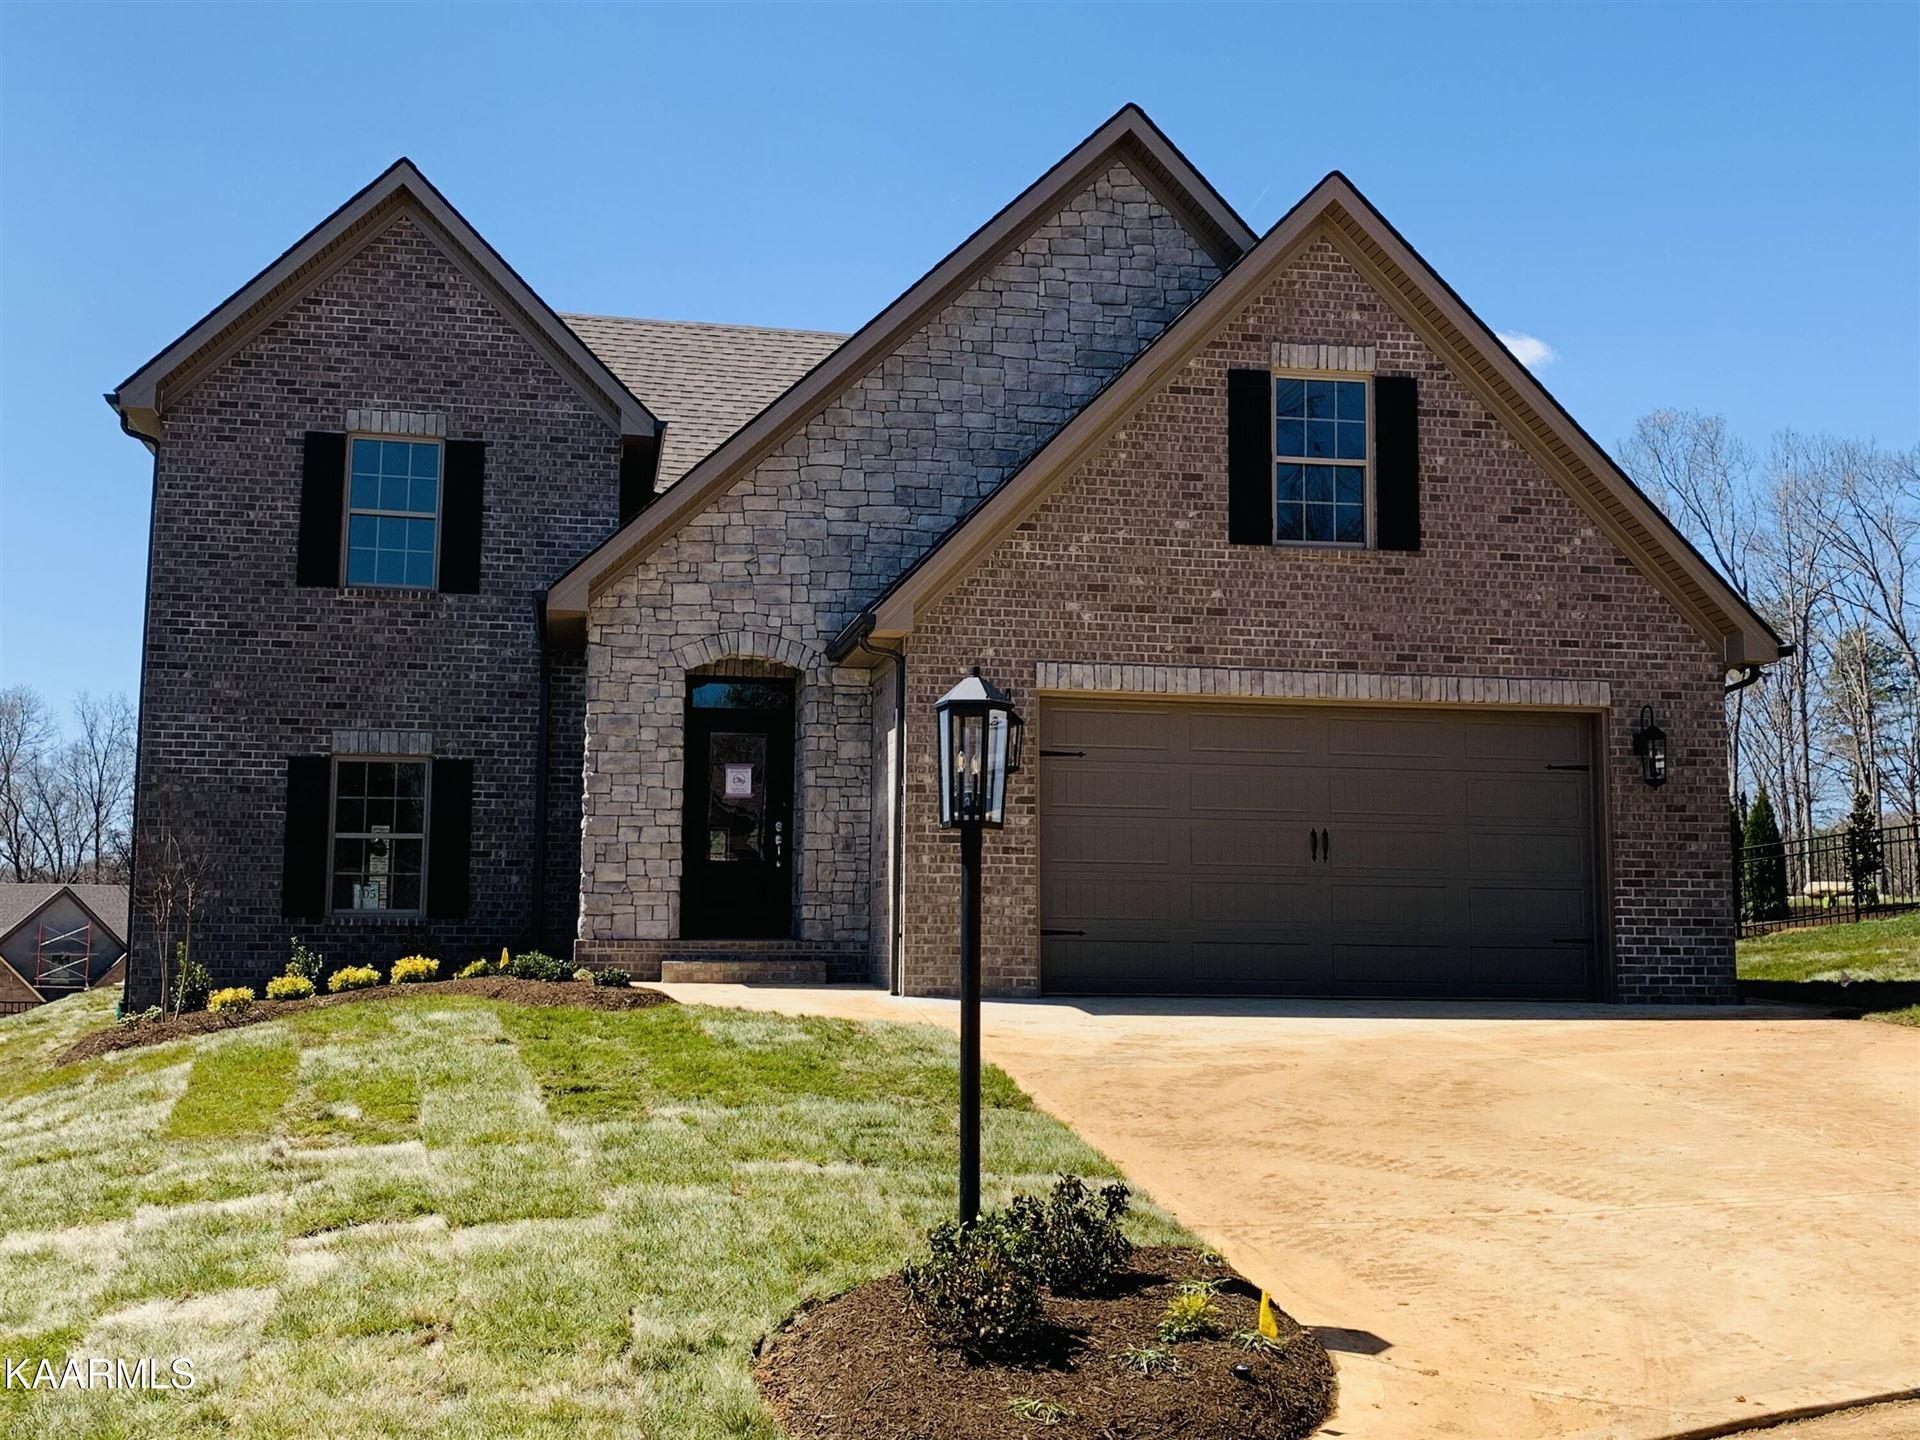 Photo of 9349 Sandy Springs Lane, Knoxville, TN 37922 (MLS # 1161392)